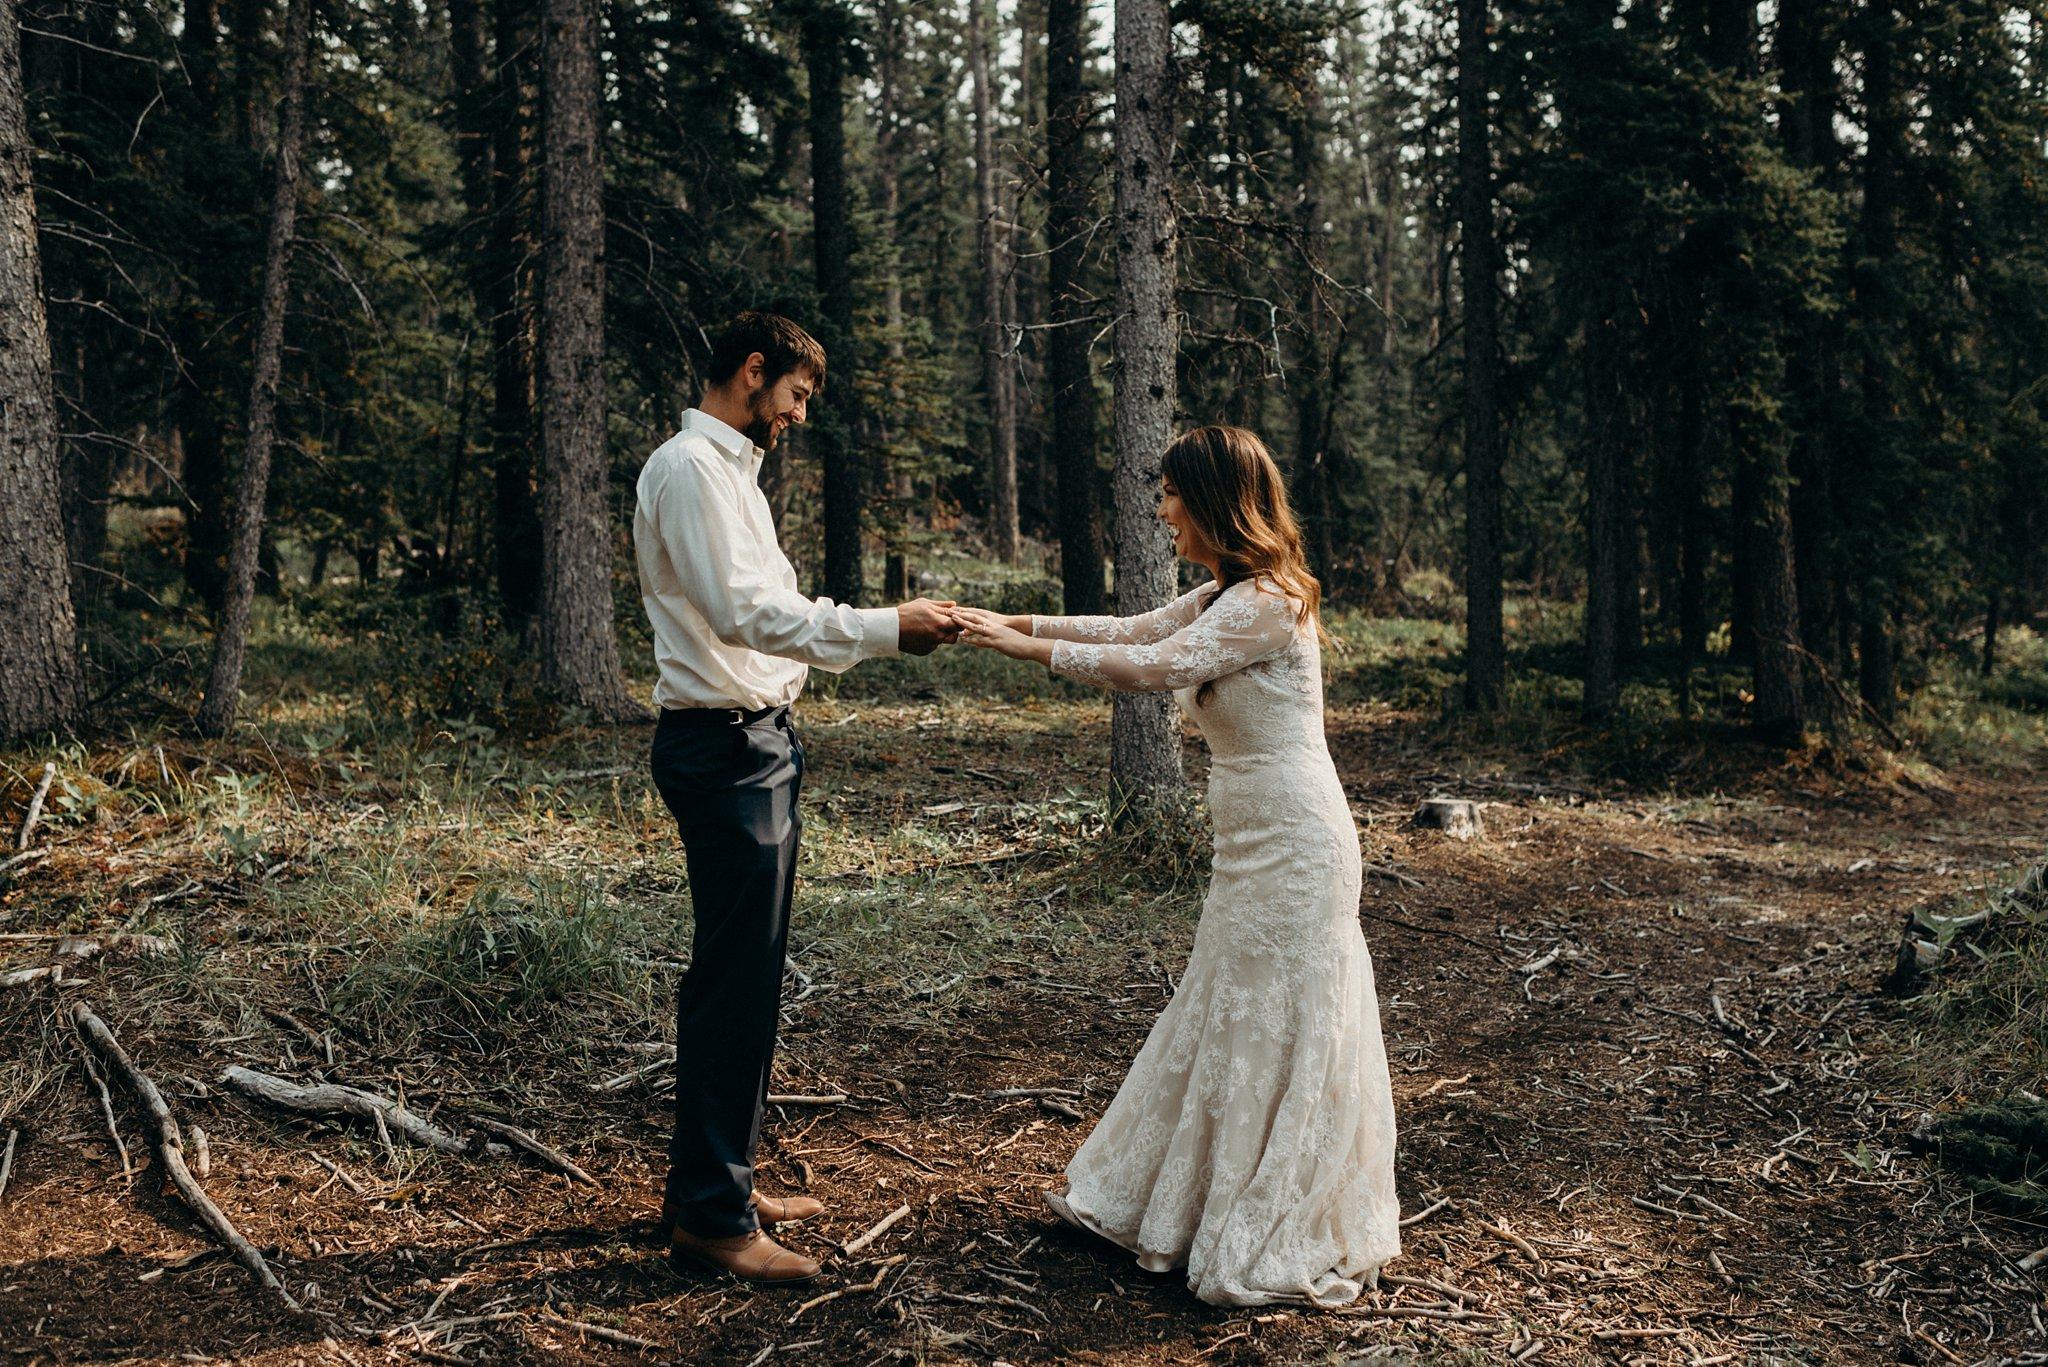 kaihla_tonai_intimate_wedding_elopement_photographer_6711.jpg